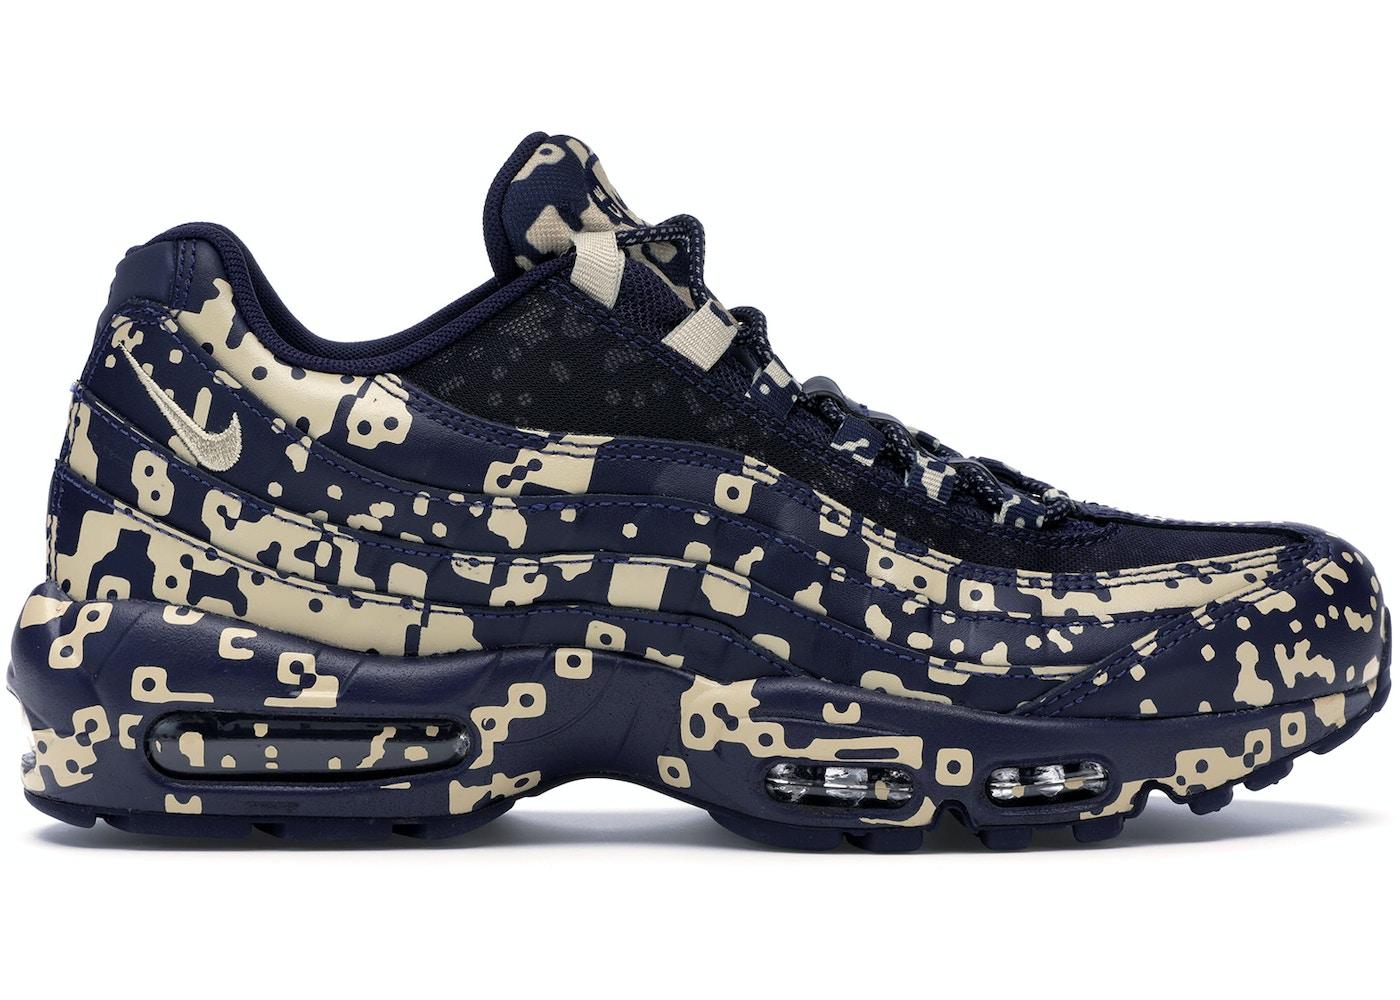 low priced c3852 efdda Nike Air Max 95 Shoes - New Highest Bids